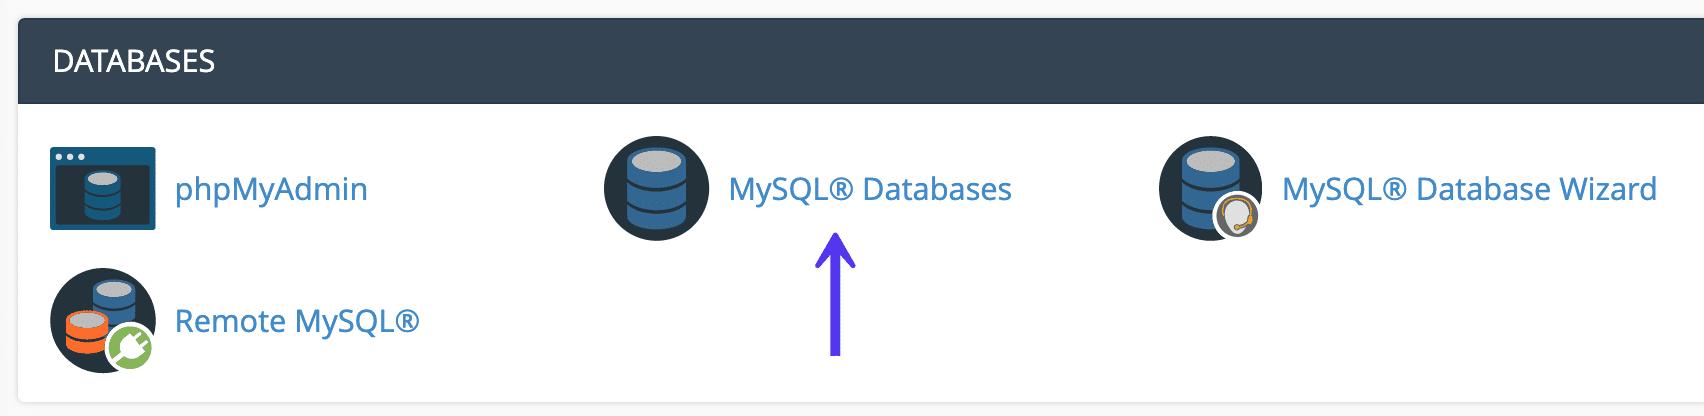 cPanel MySQL Datenbank